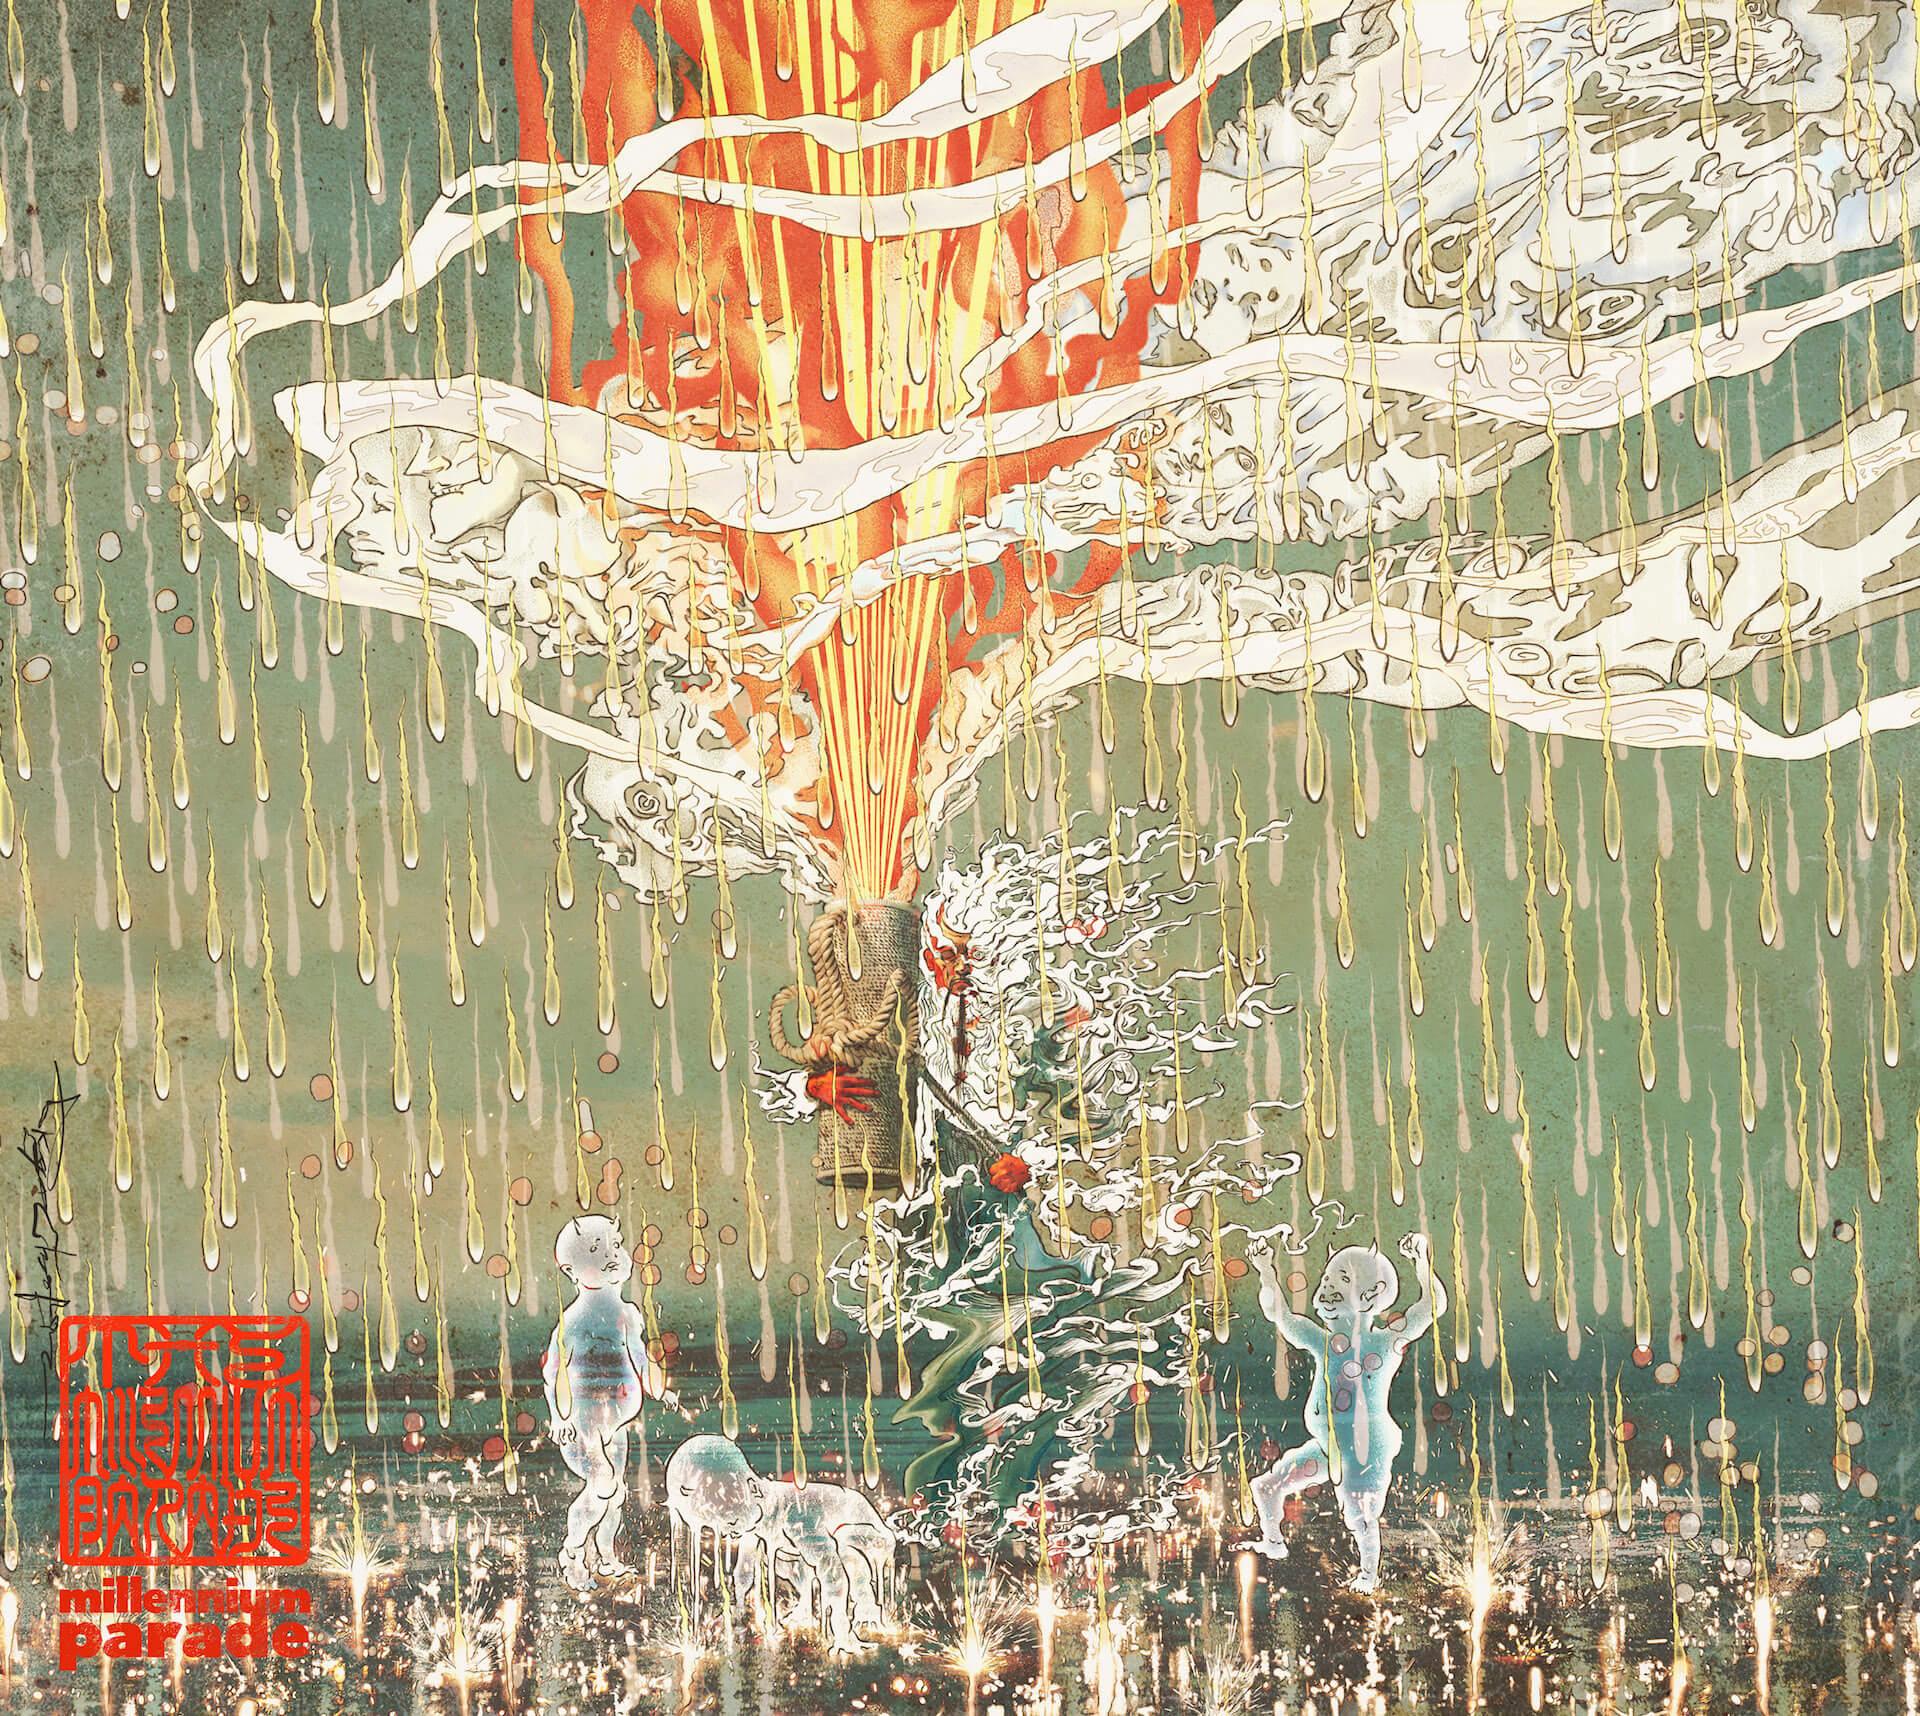 millennium paradeがNHK新シリーズ『2030 未来への分岐点』のテーマソングを担当!King Gnu常田大希に密着したドキュメンタリーも放送決定 music201203_millenniumparade_7